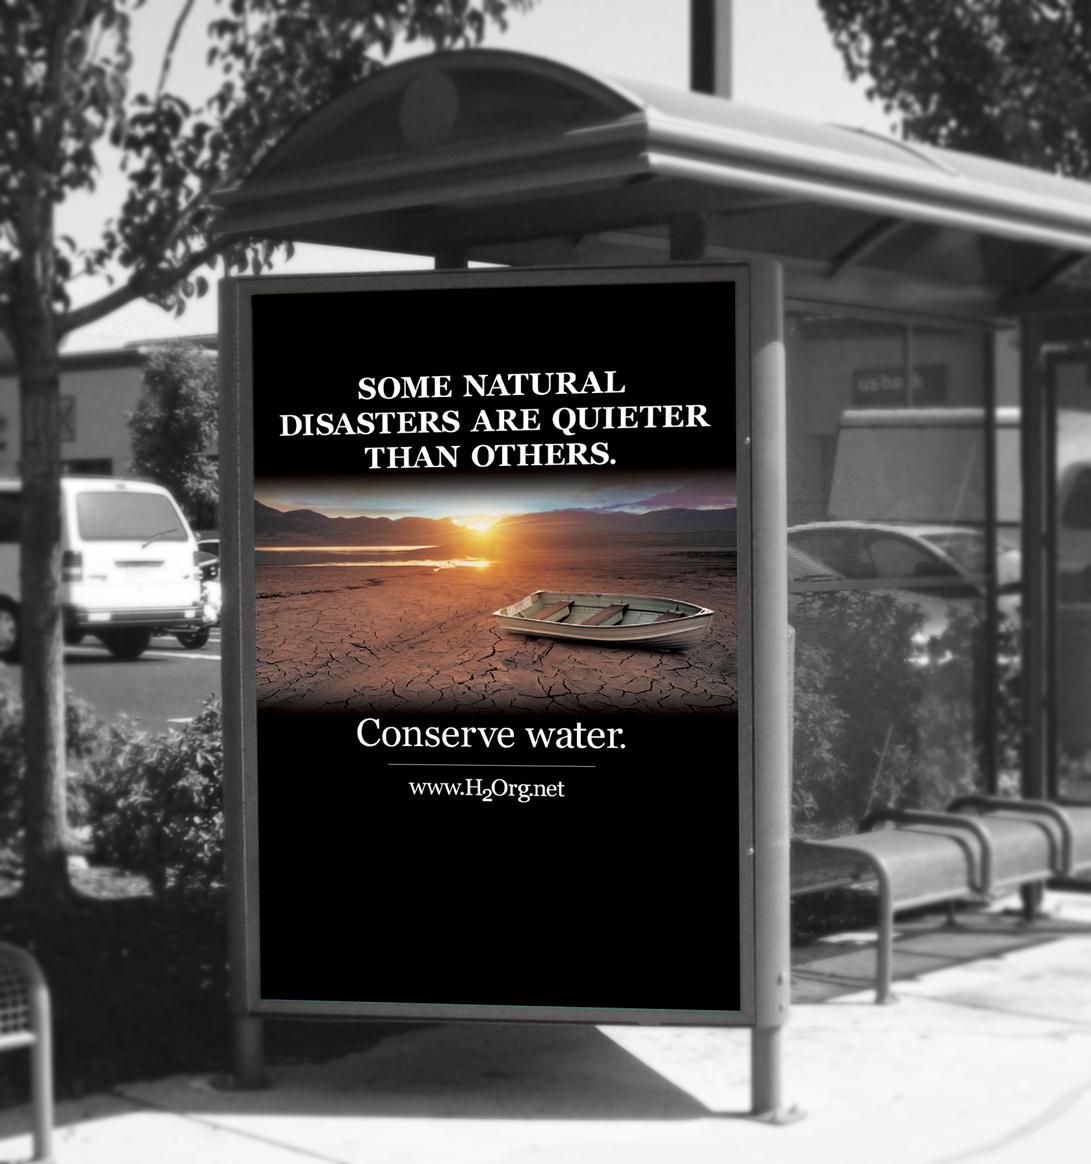 Denver_Water_BusShelter_grayscale.jpg